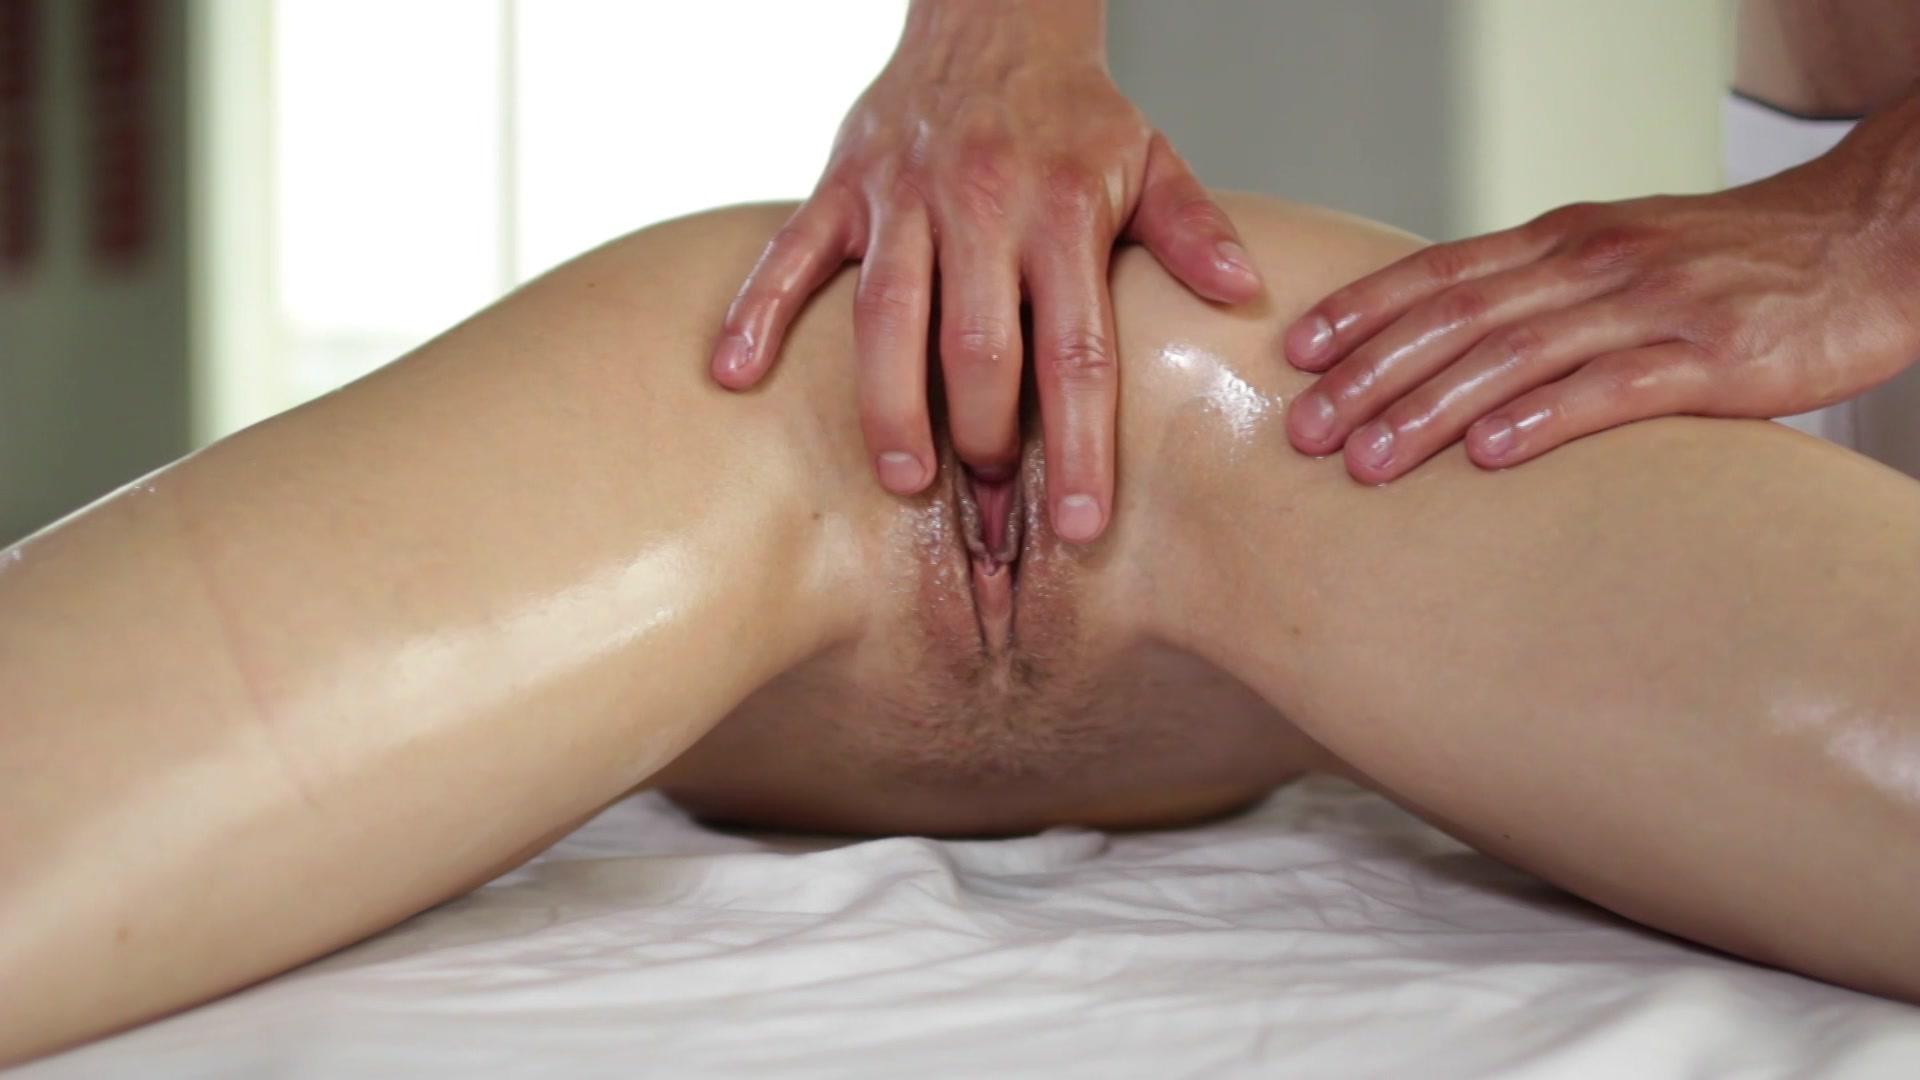 Массаж руками до оргазма — 14